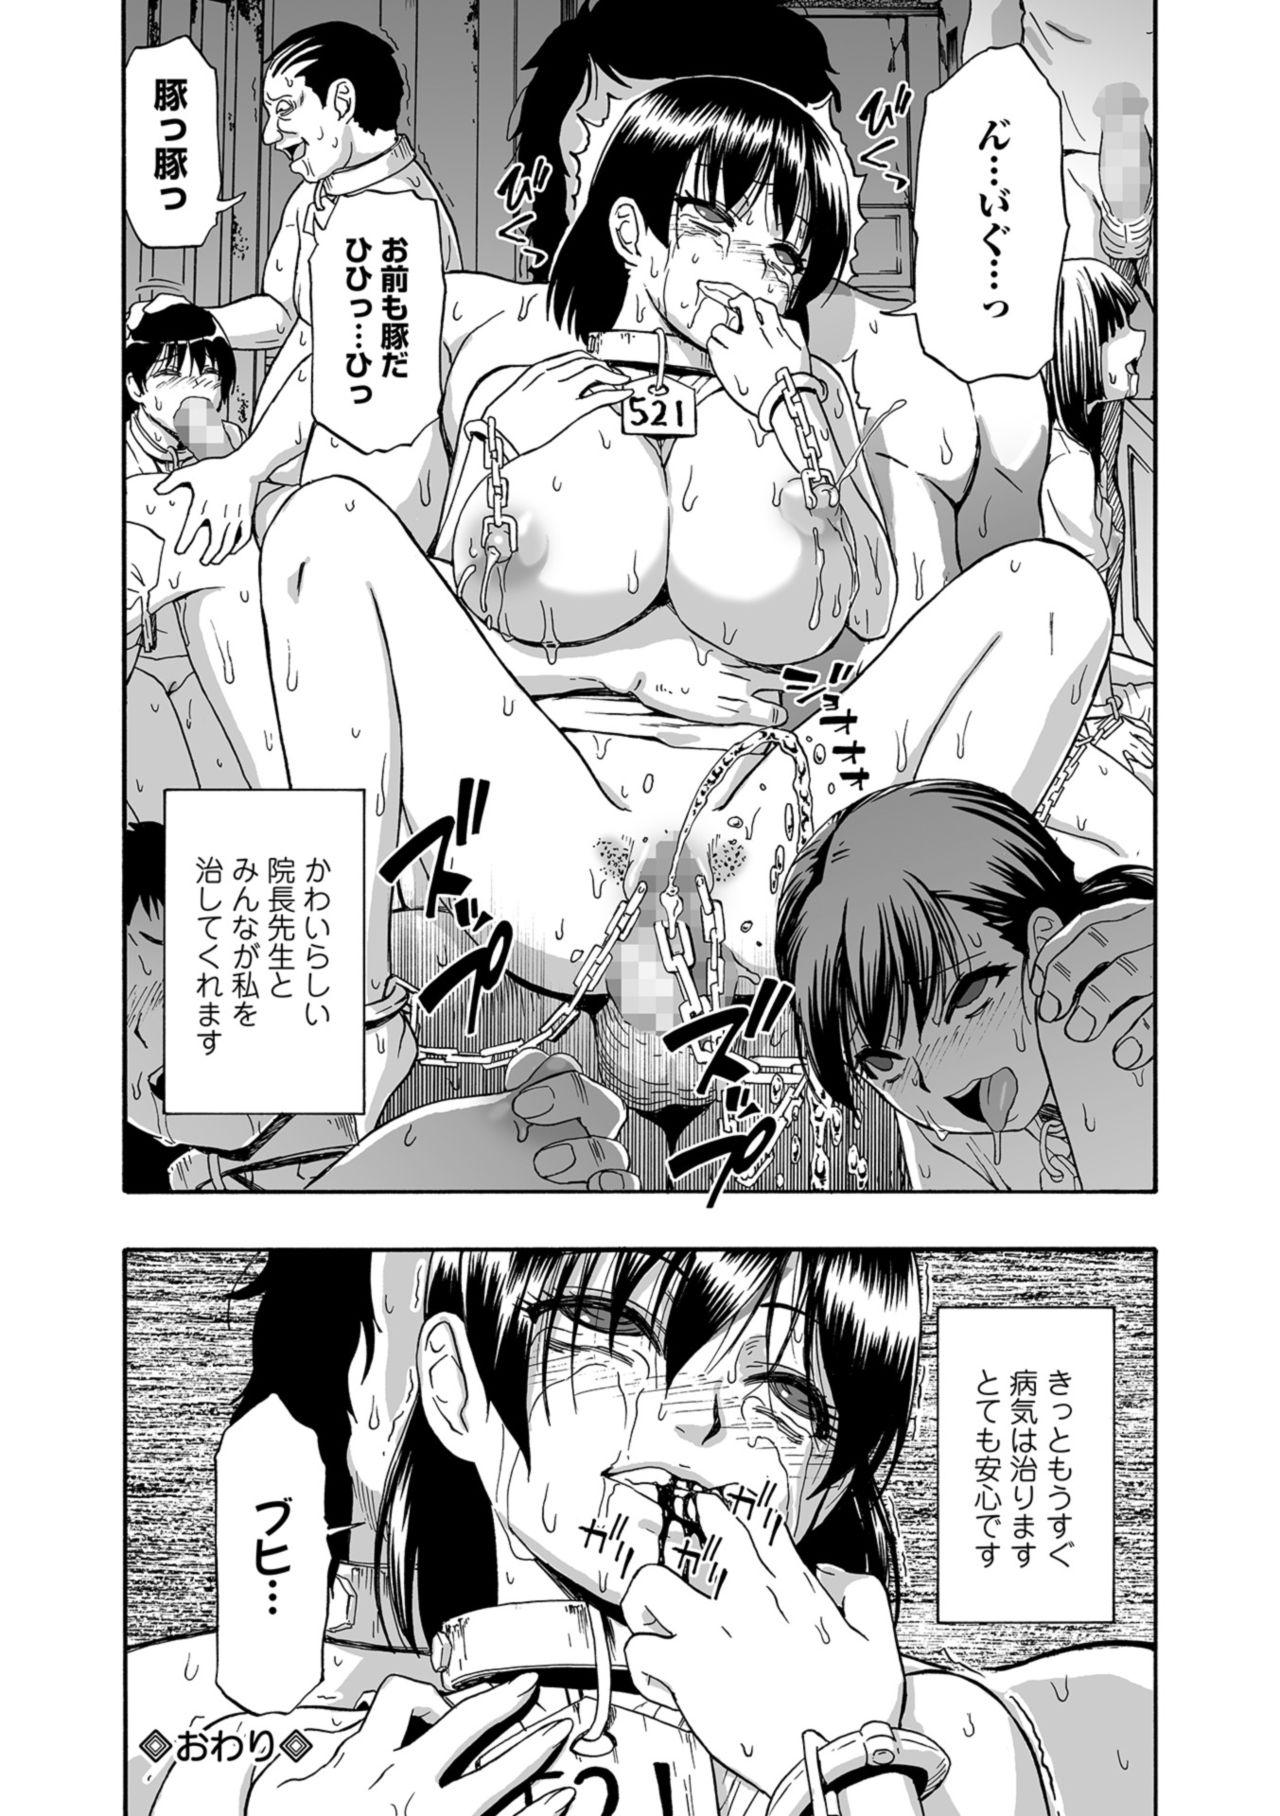 Gusha no Ishi 195